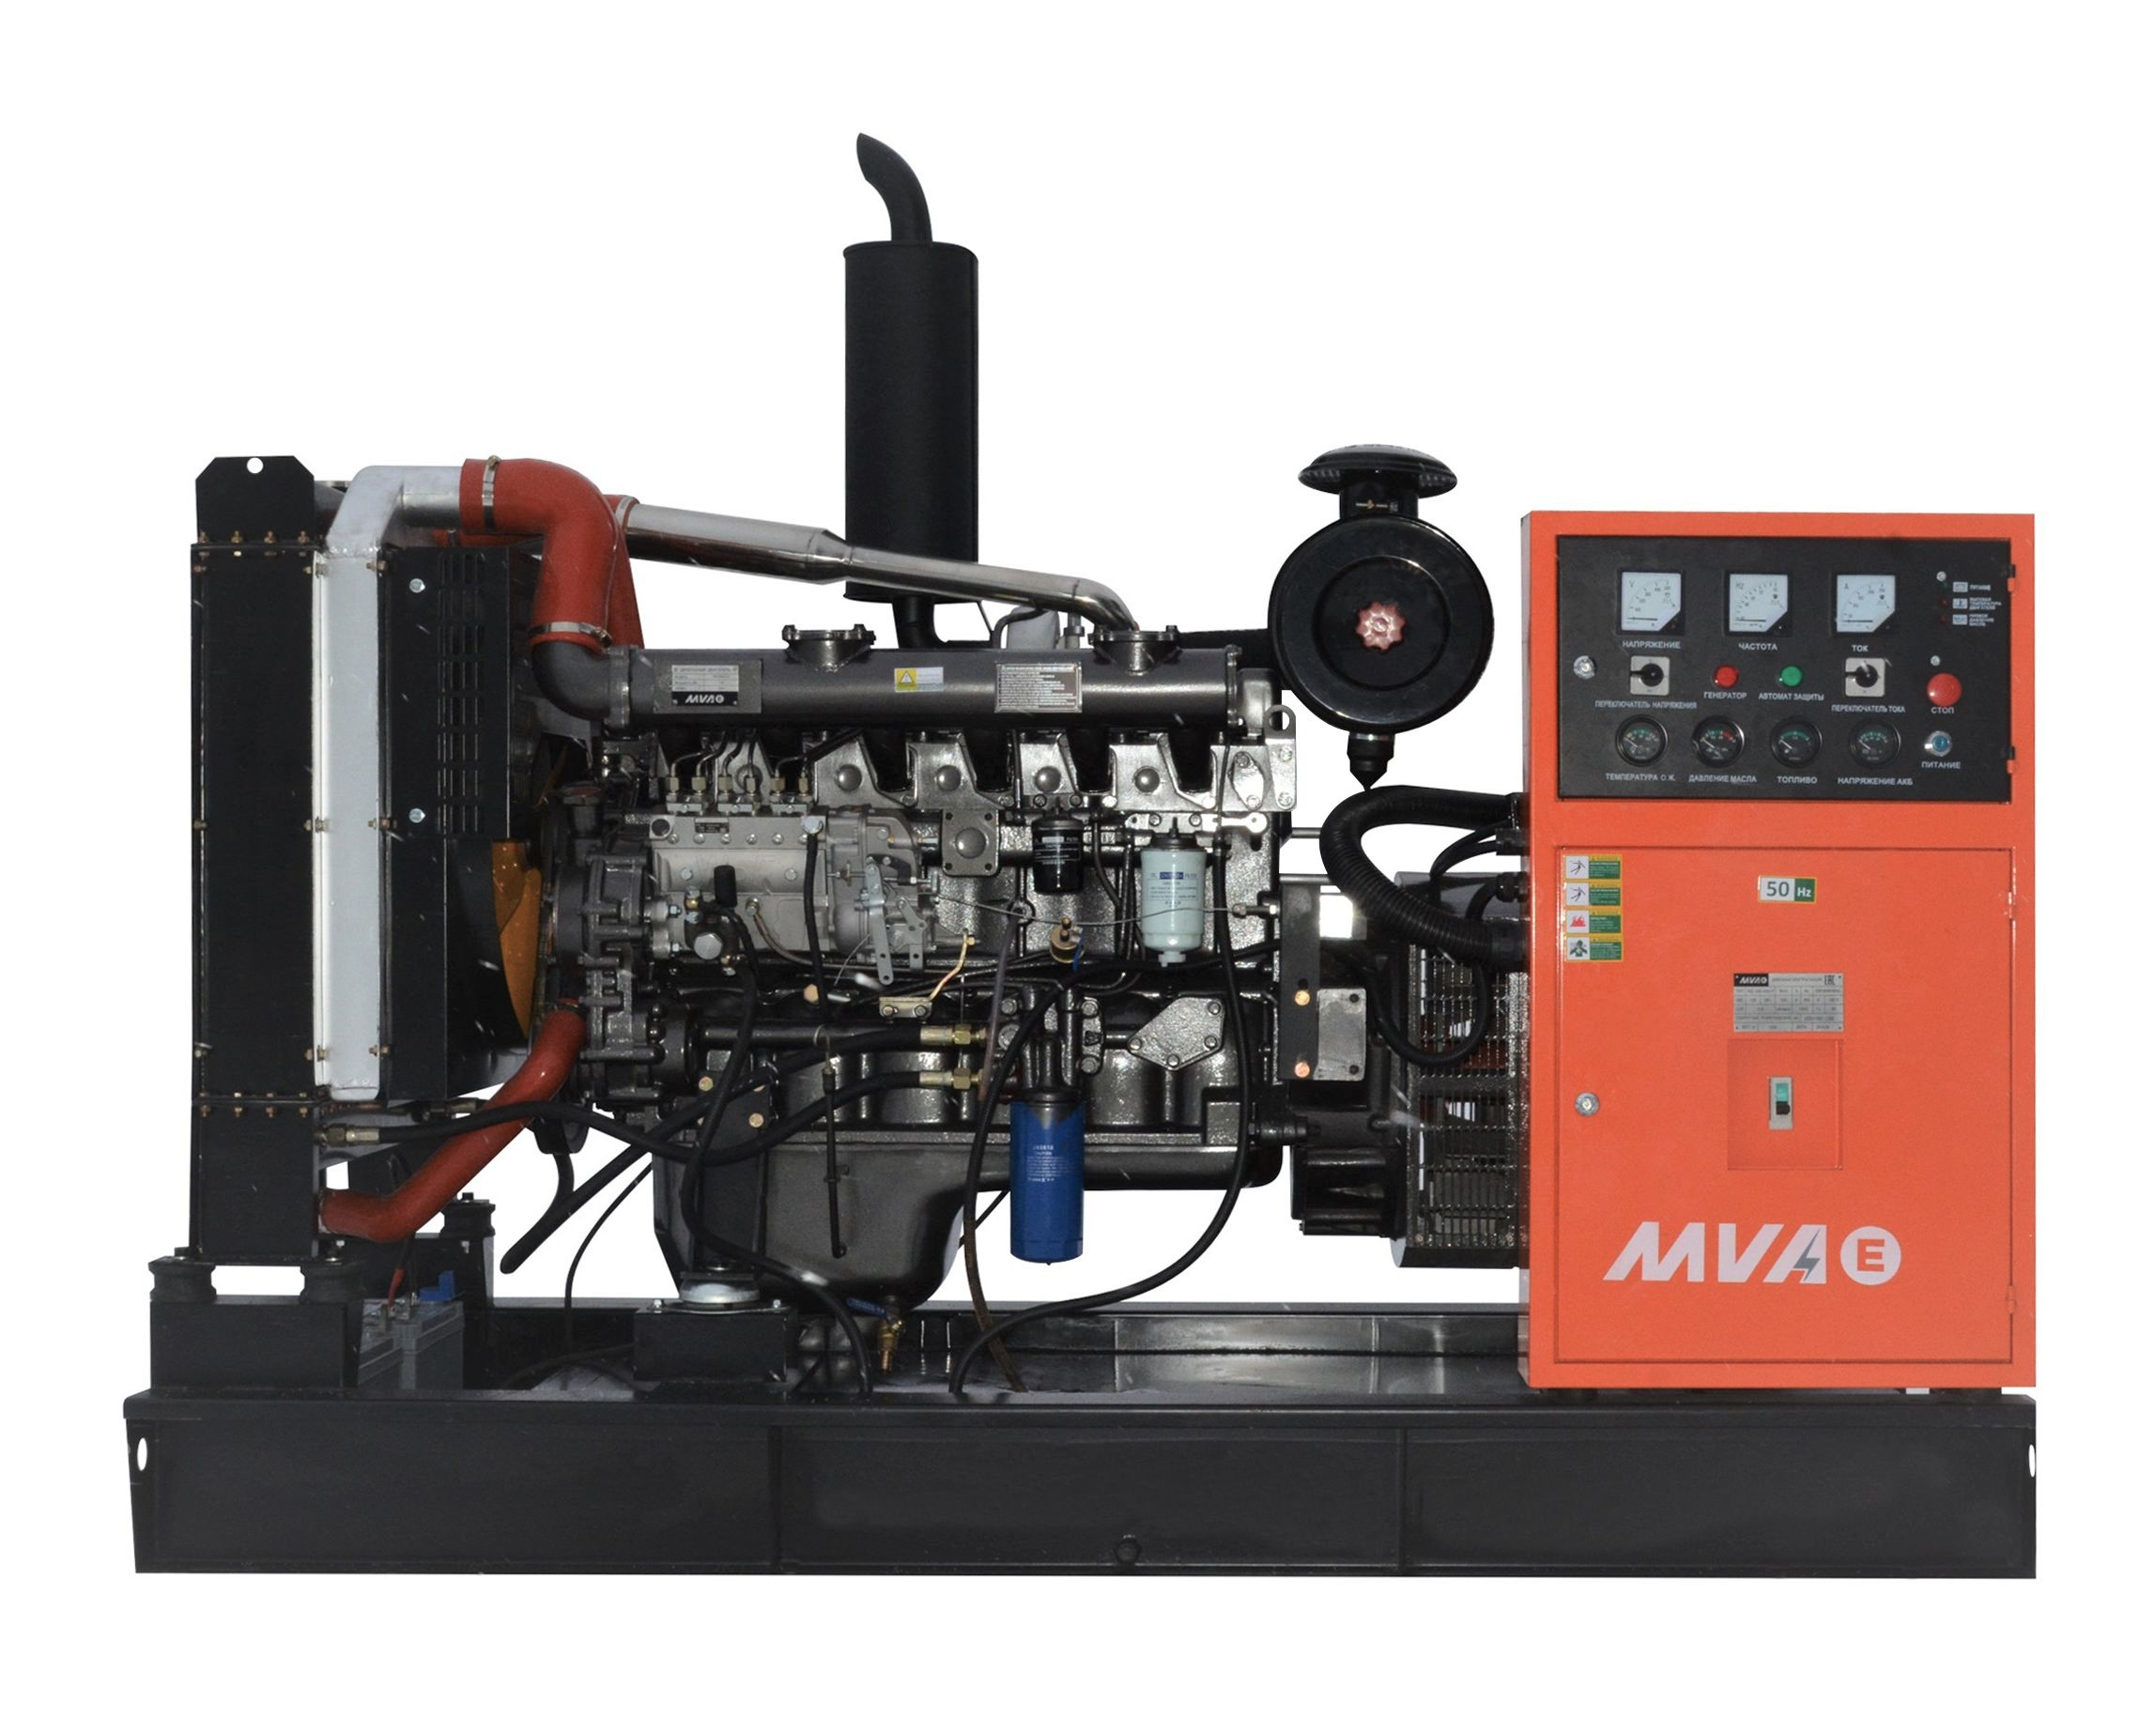 Дизель-генератор Mvae АД-130-400-Р